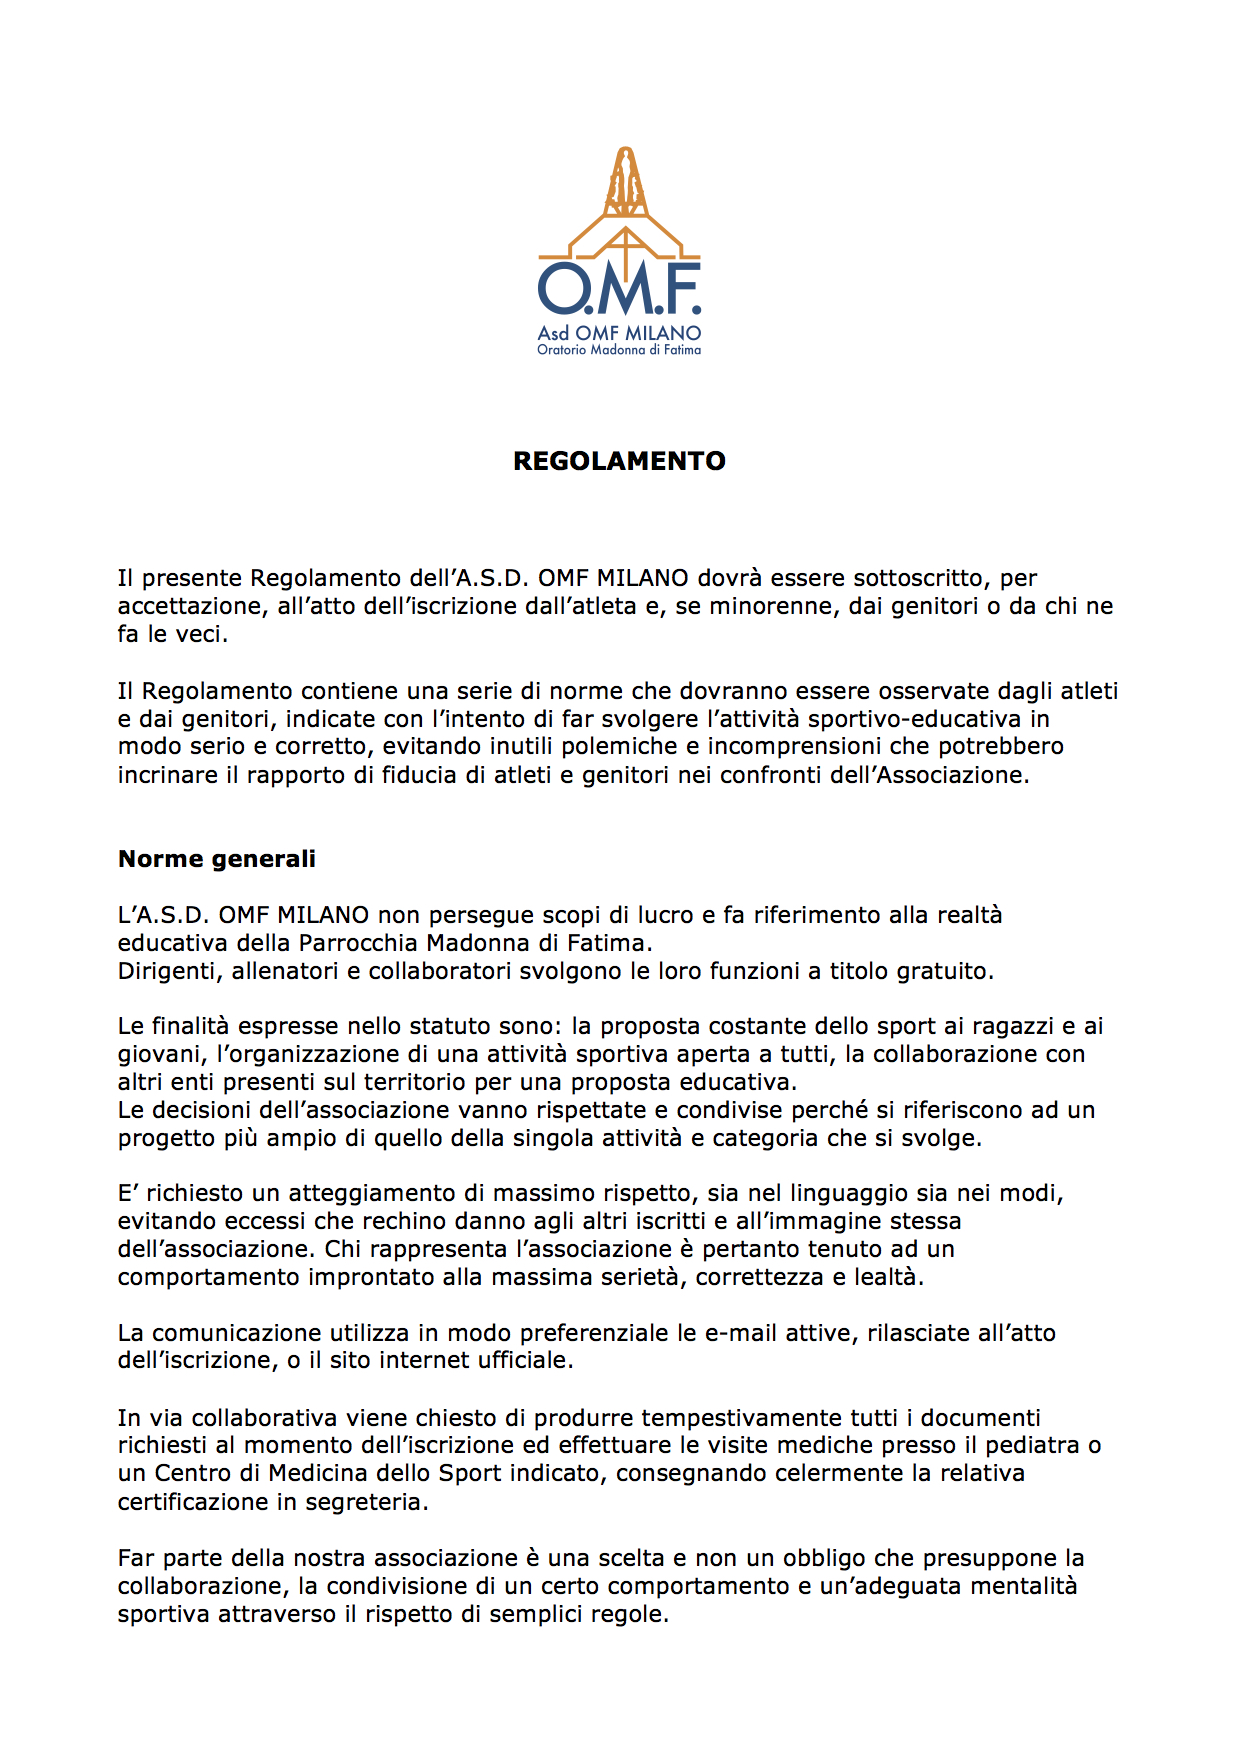 OMF - Regolamento interno 1